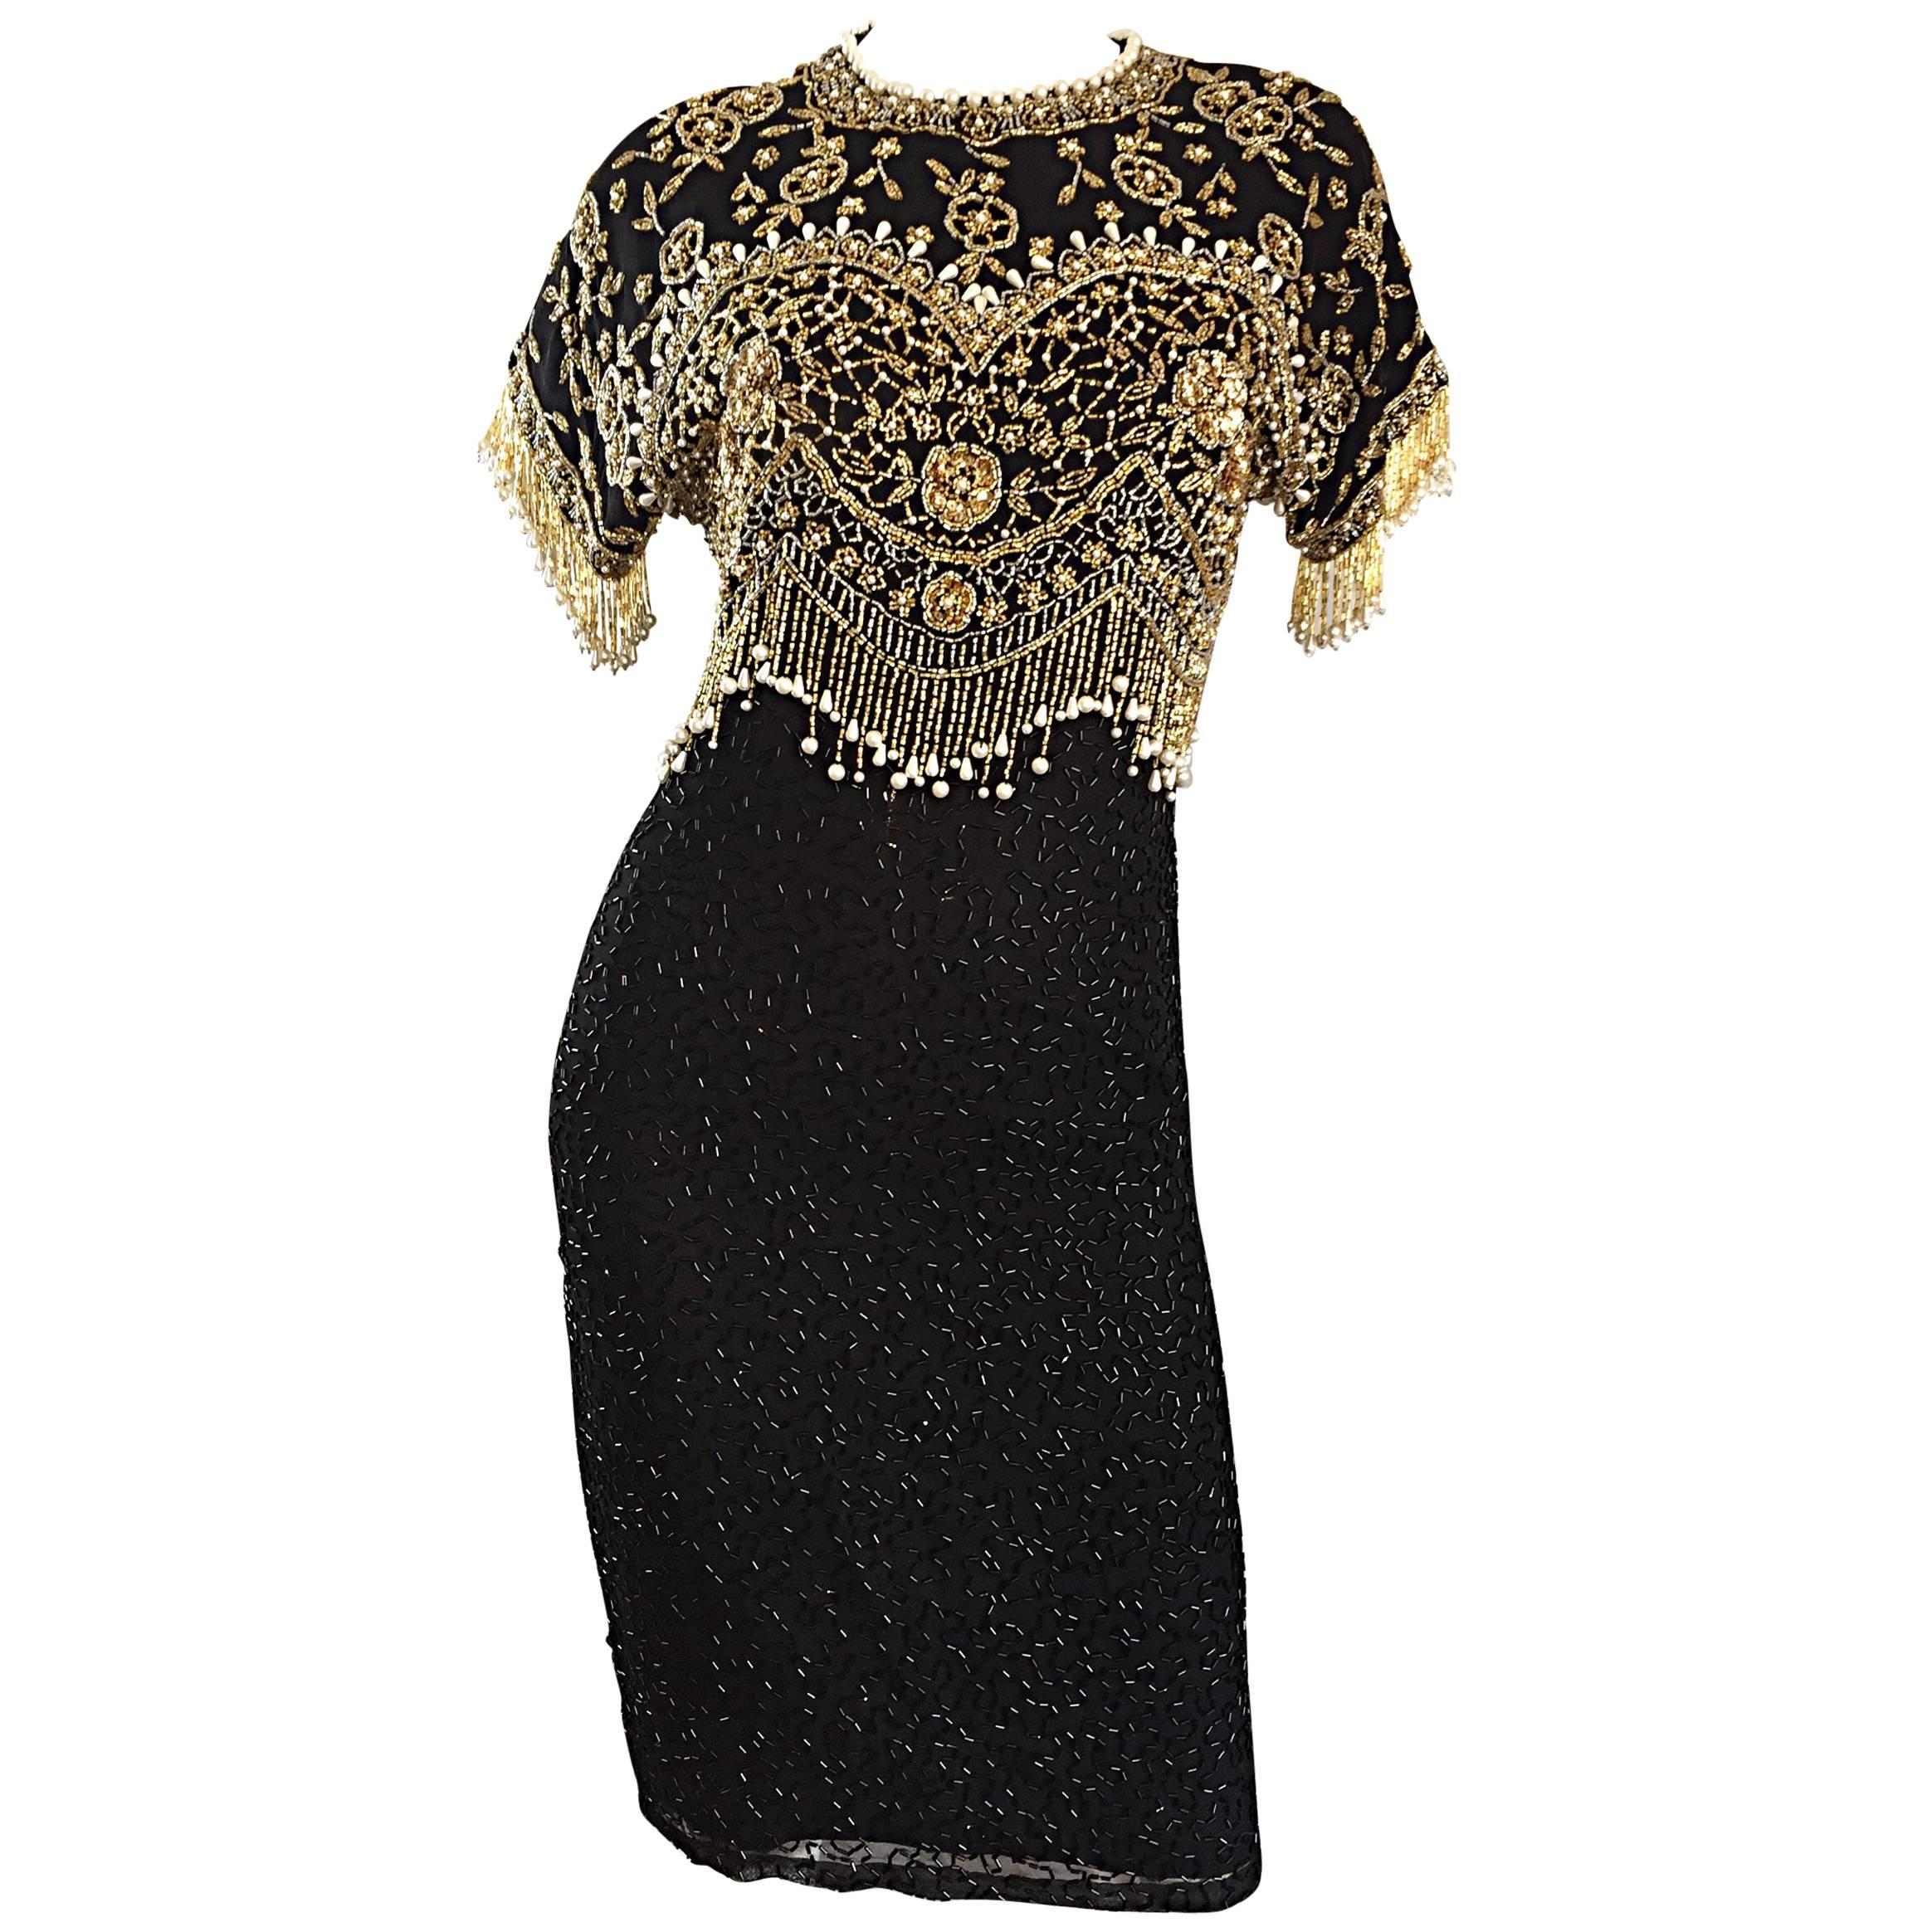 Vintage Lillie Rubin 1990s Amazing Fully Beaded Sequined Pearl Silk Fringe Dress